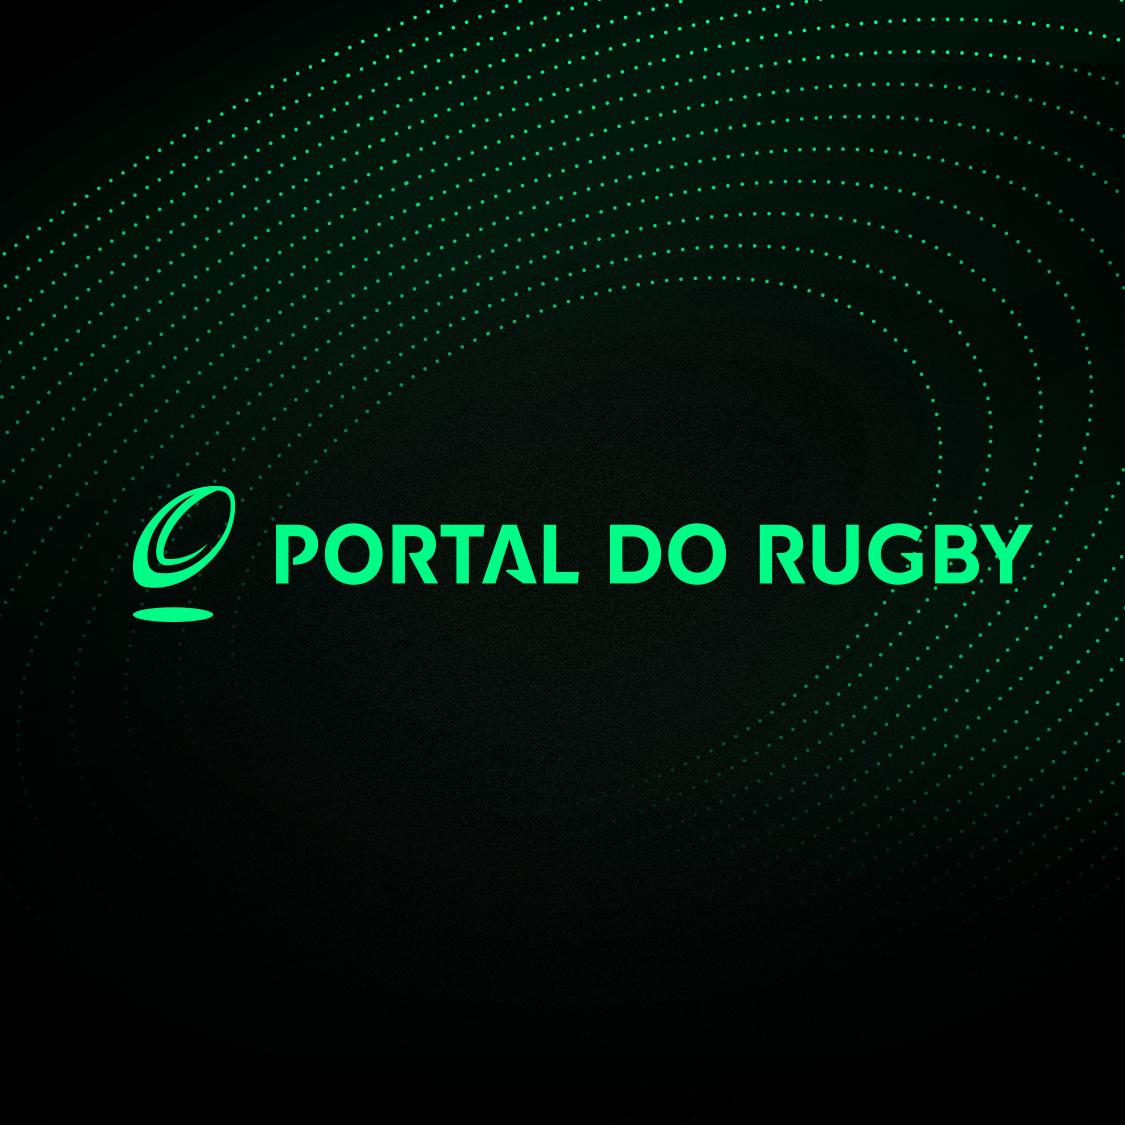 Branding Portal do Rugby